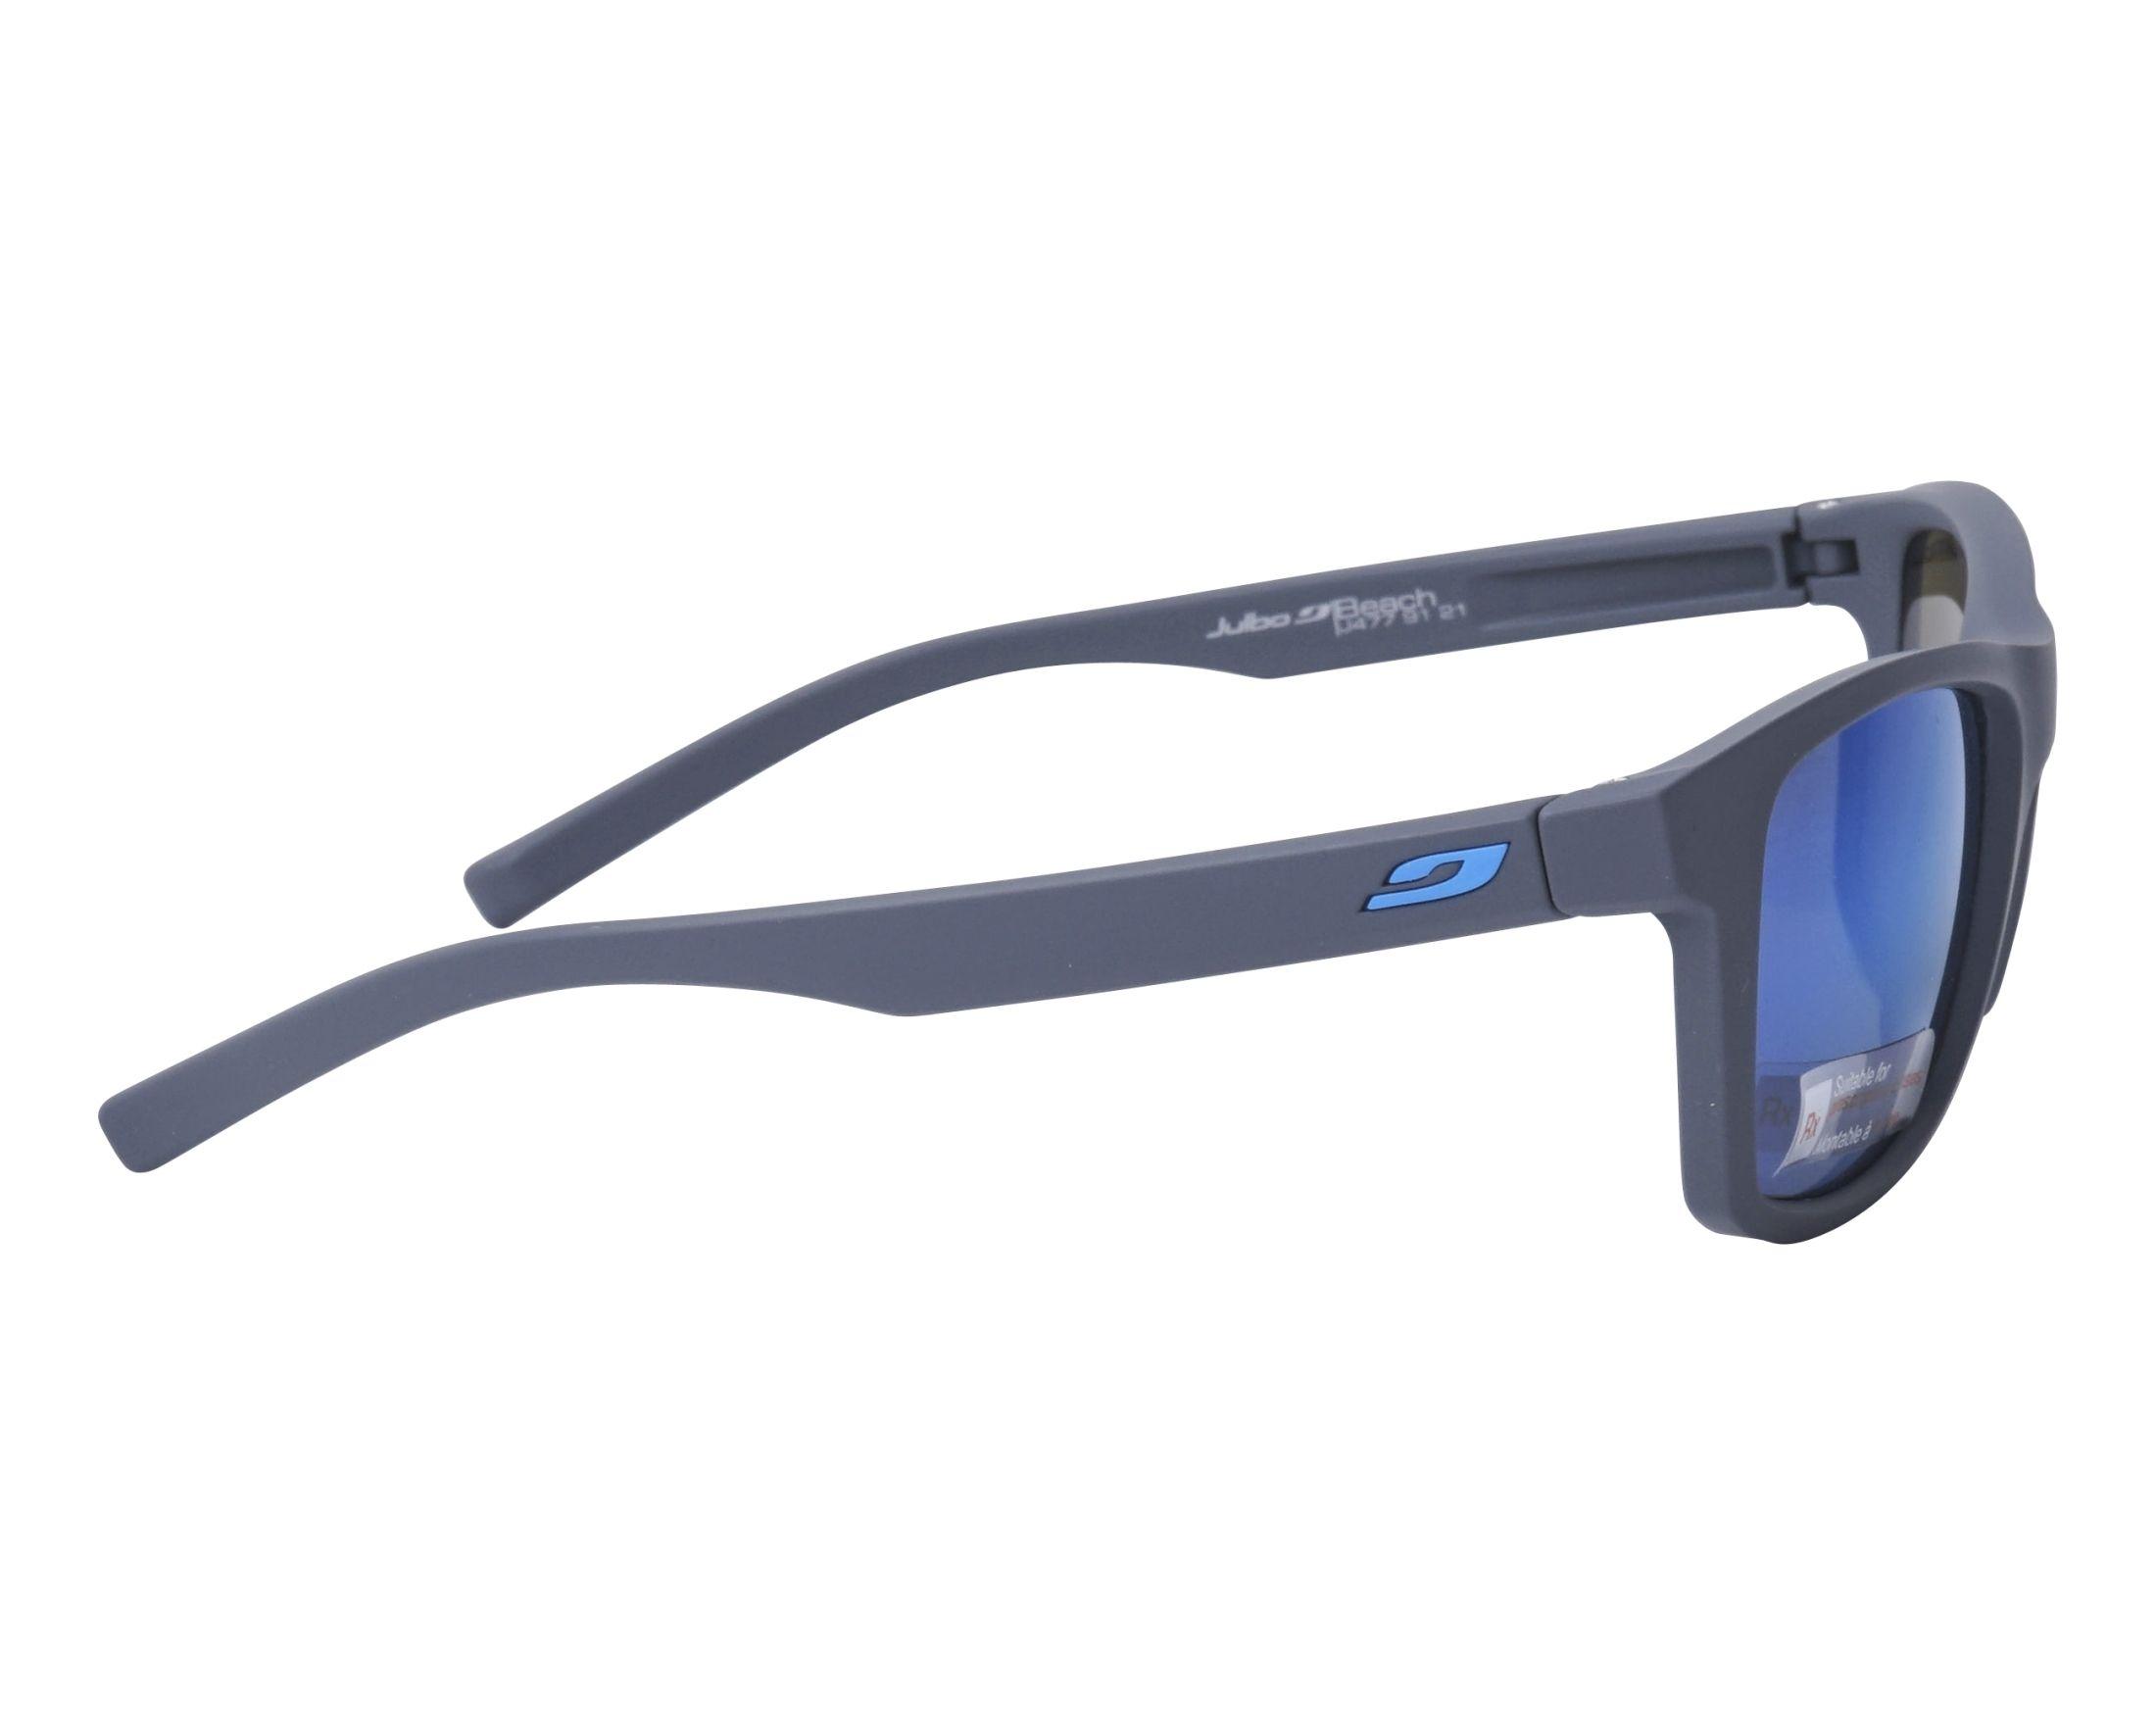 14977672f1 Sunglasses Julbo J477 9121 50-19 Grey side view